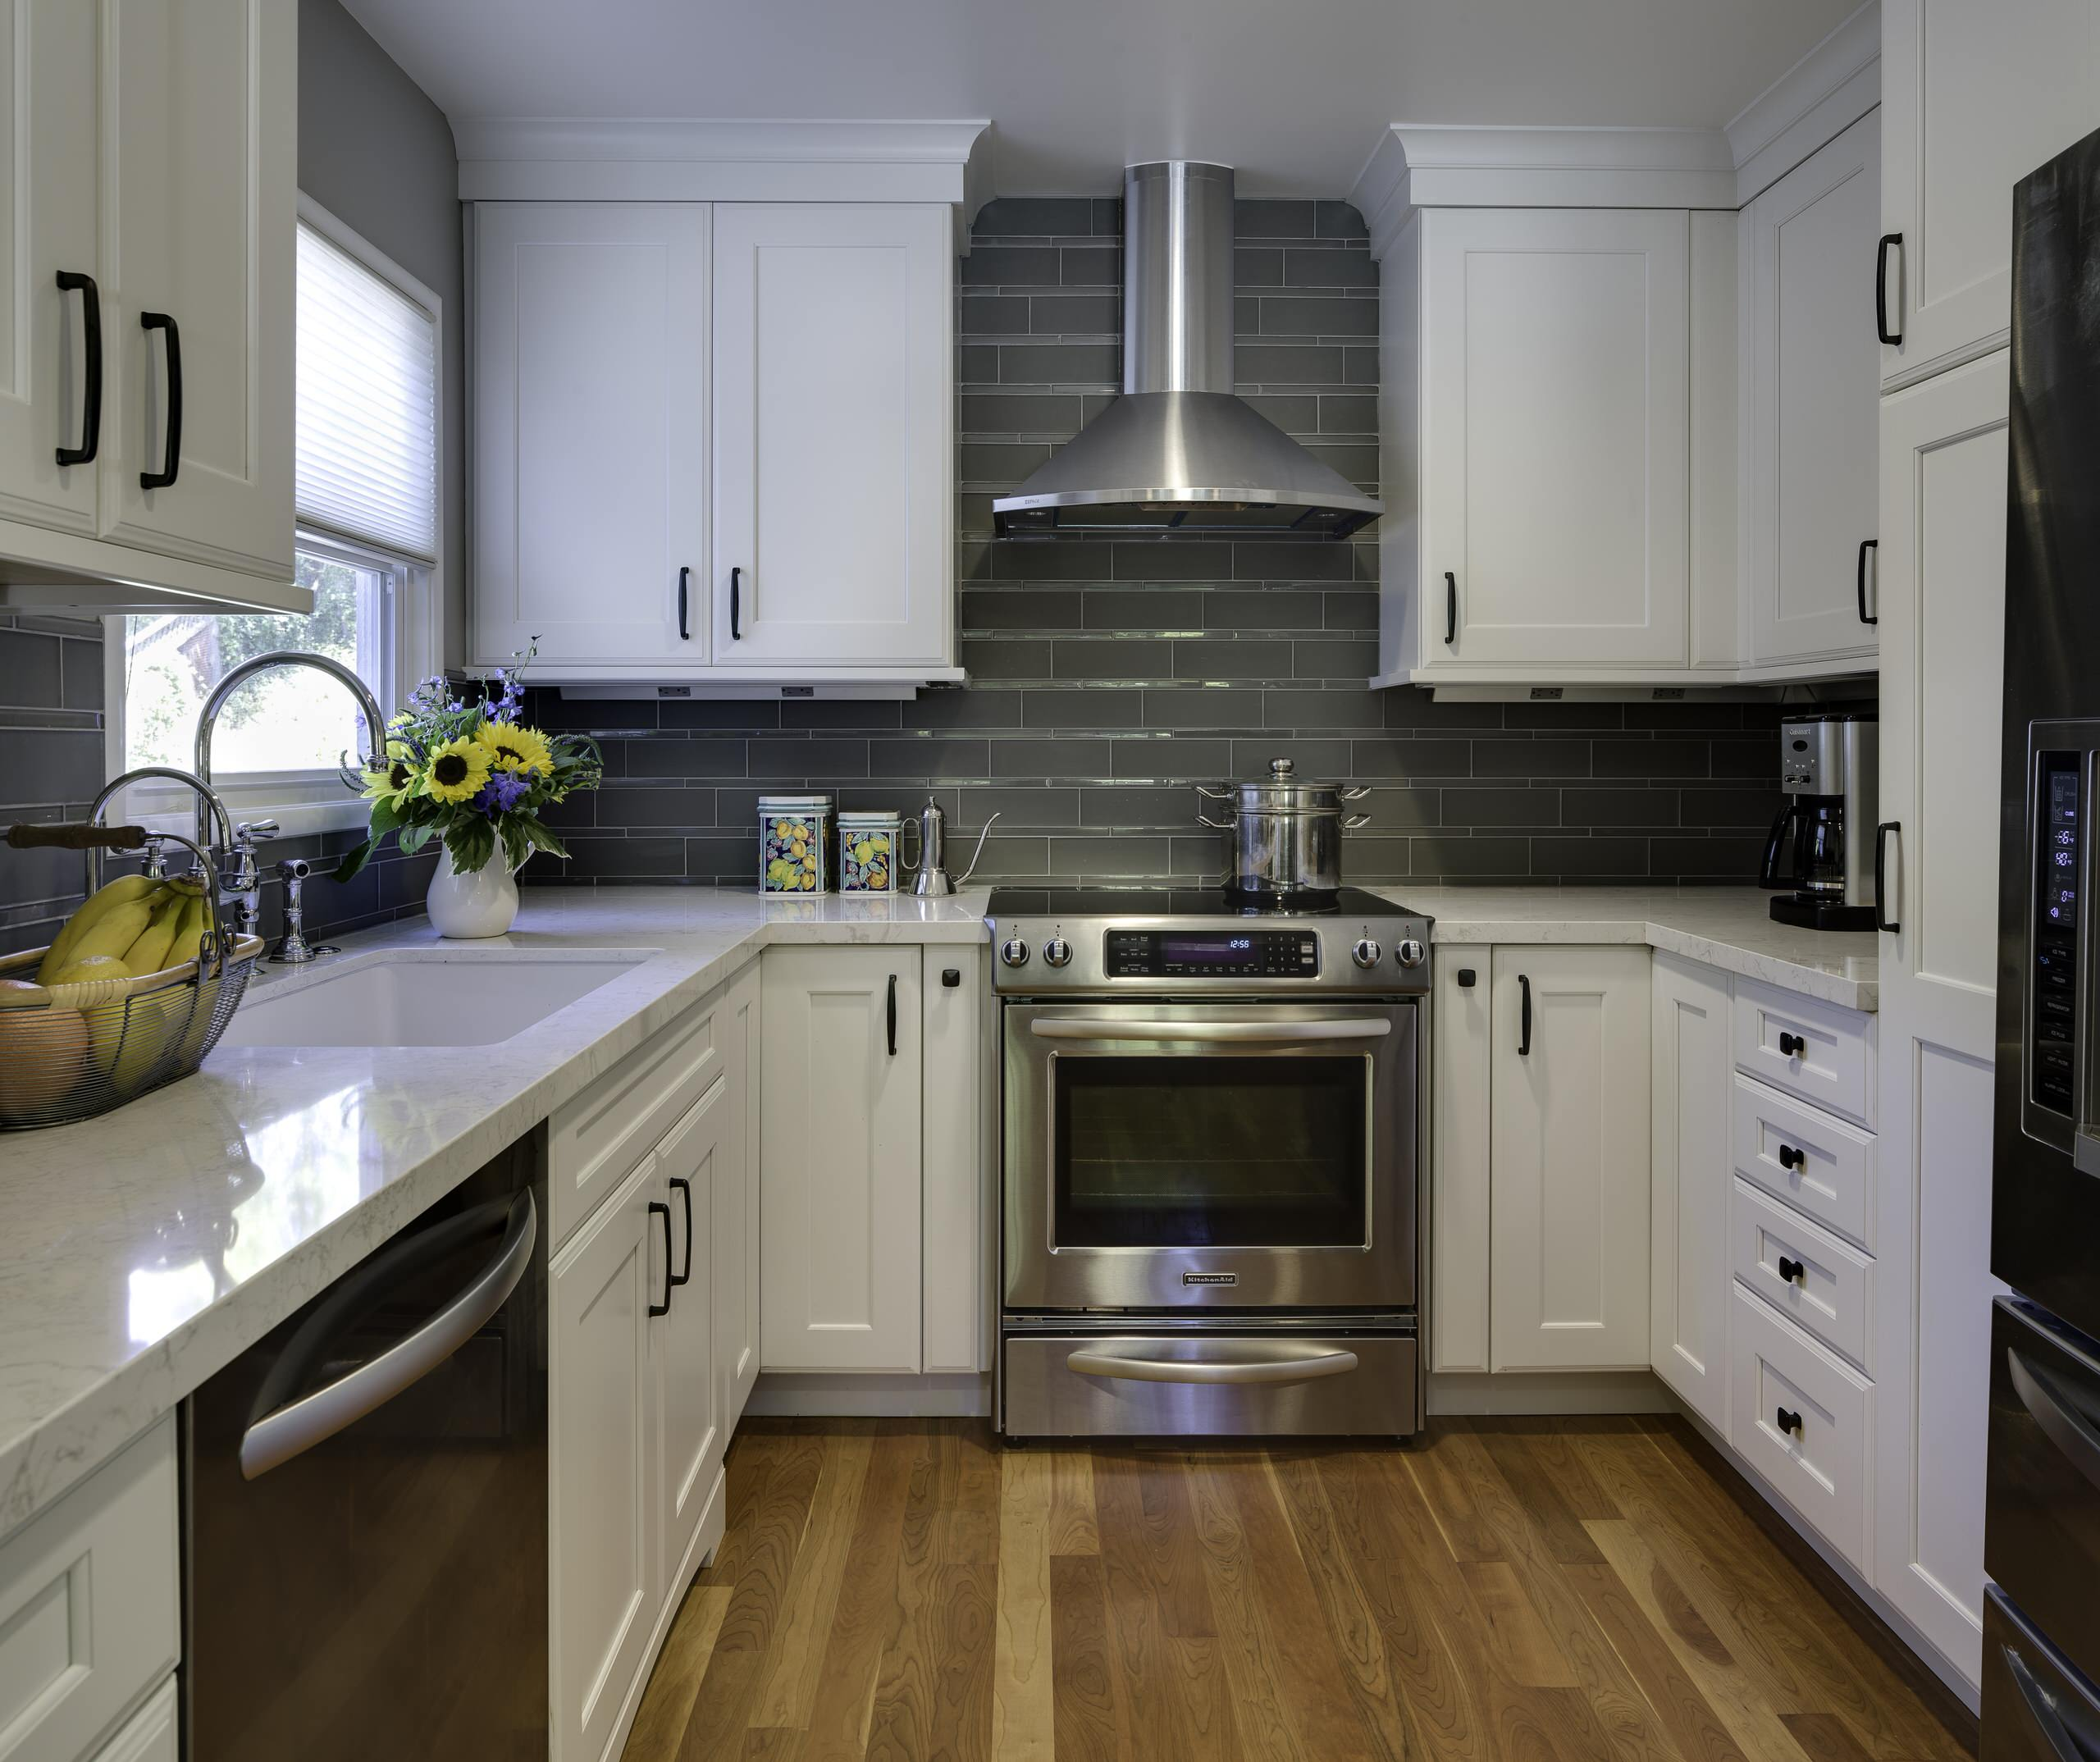 12 X 18 Kitchen Ideas Photos Houzz